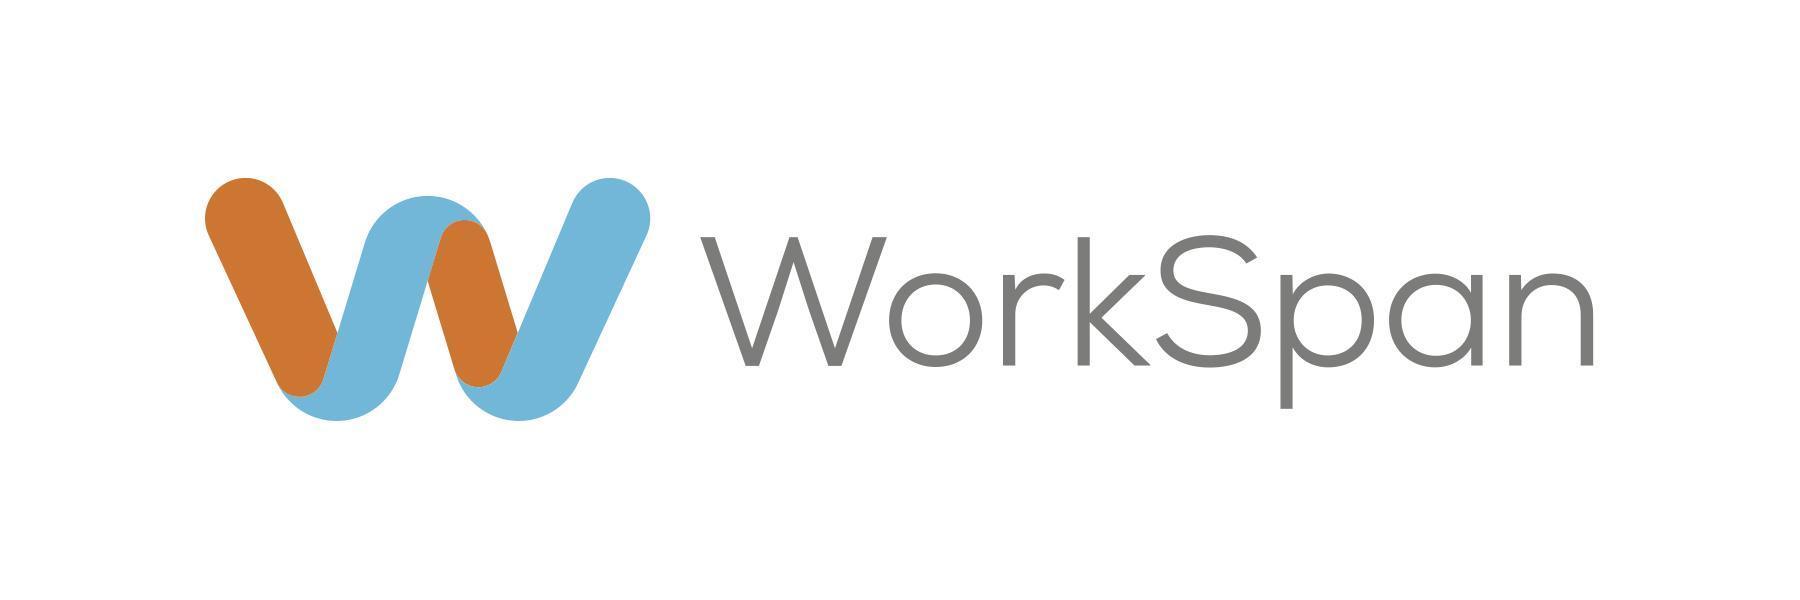 WorkSpan company logo